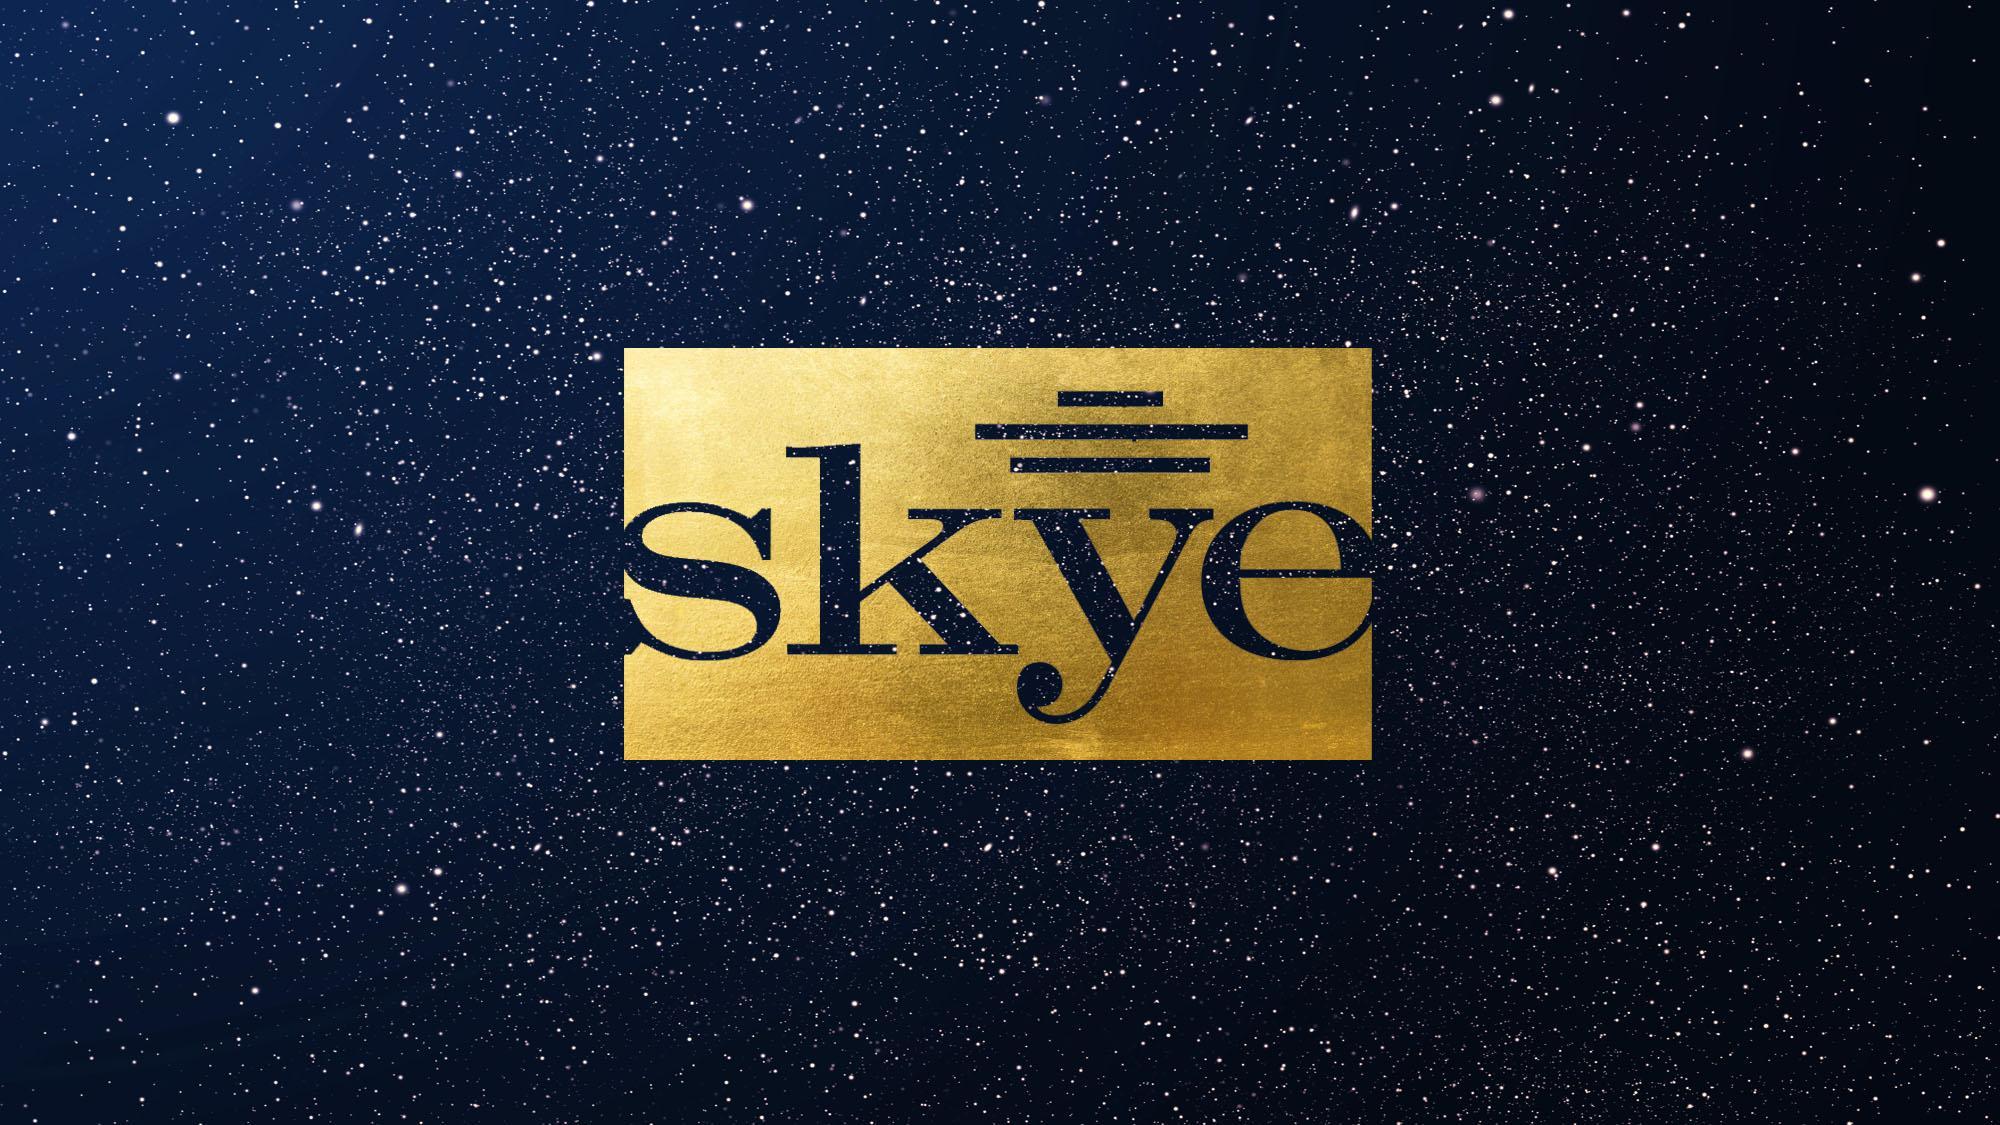 Skye Nashville